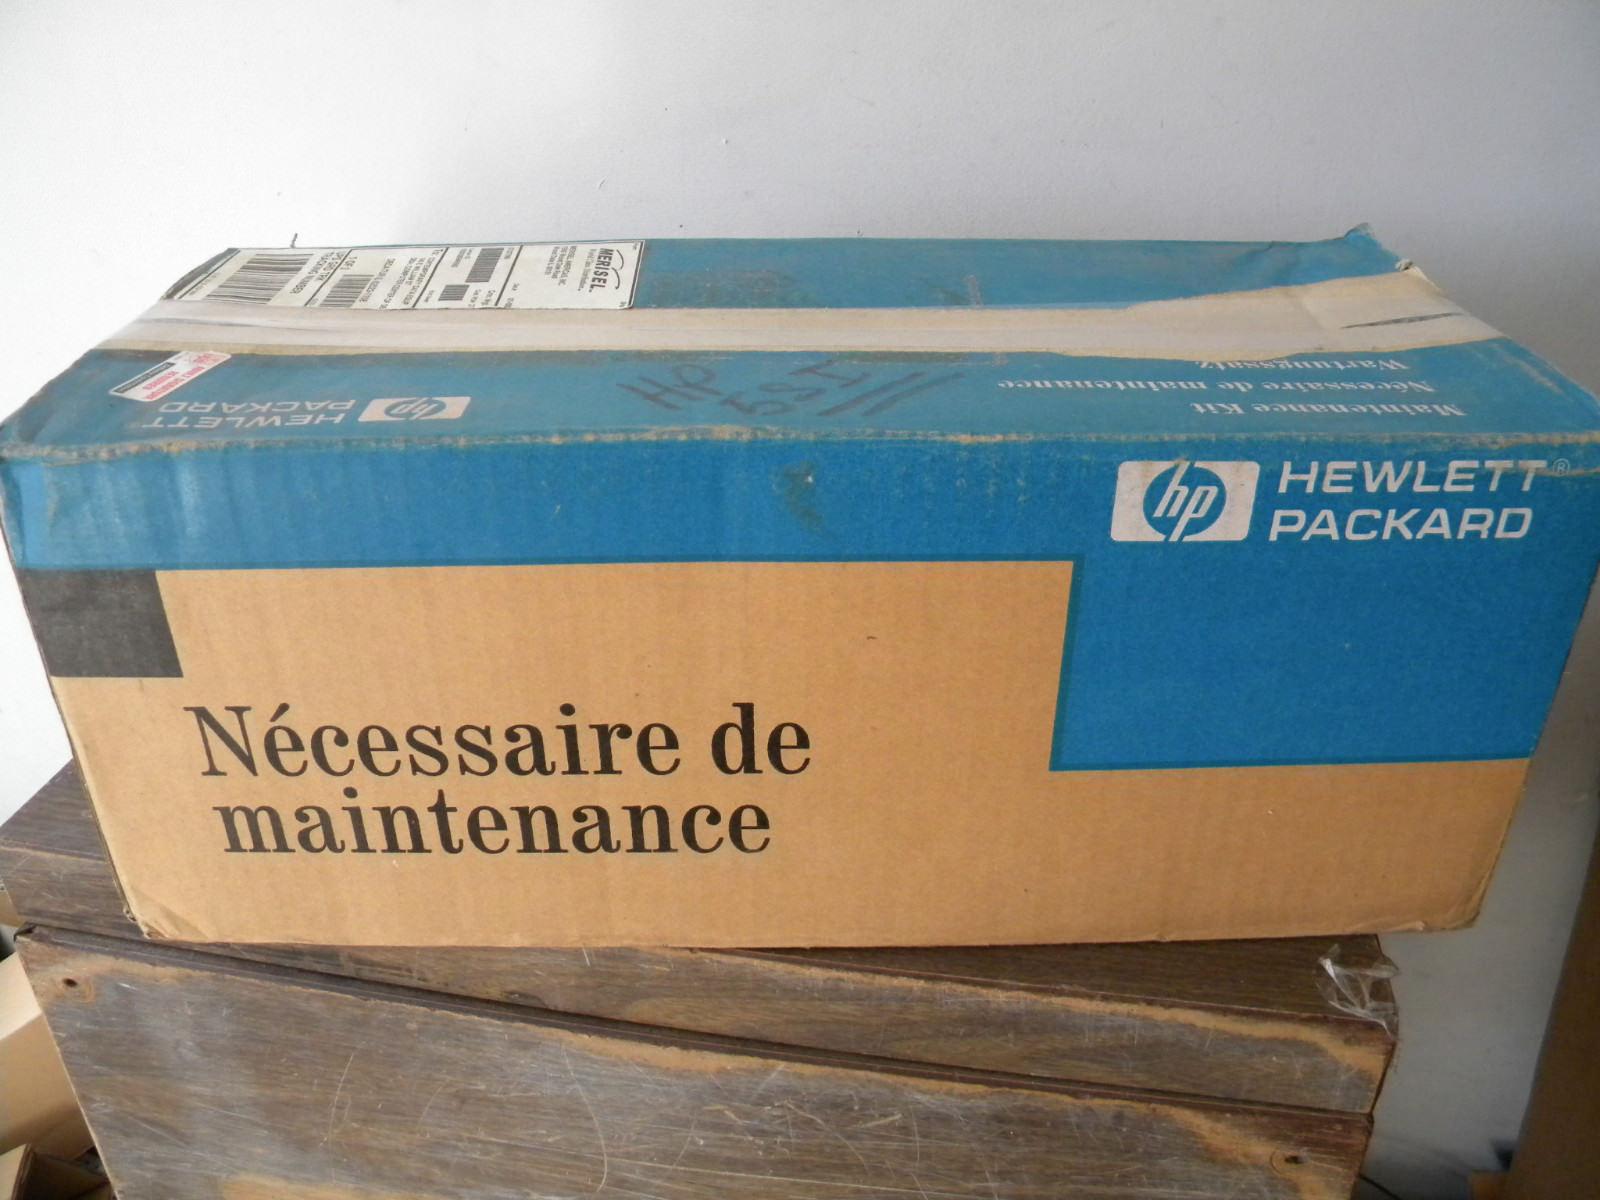 Hewlett Packard C3971B Maintenance Kit R77-1042 for 5si and 8000 printers